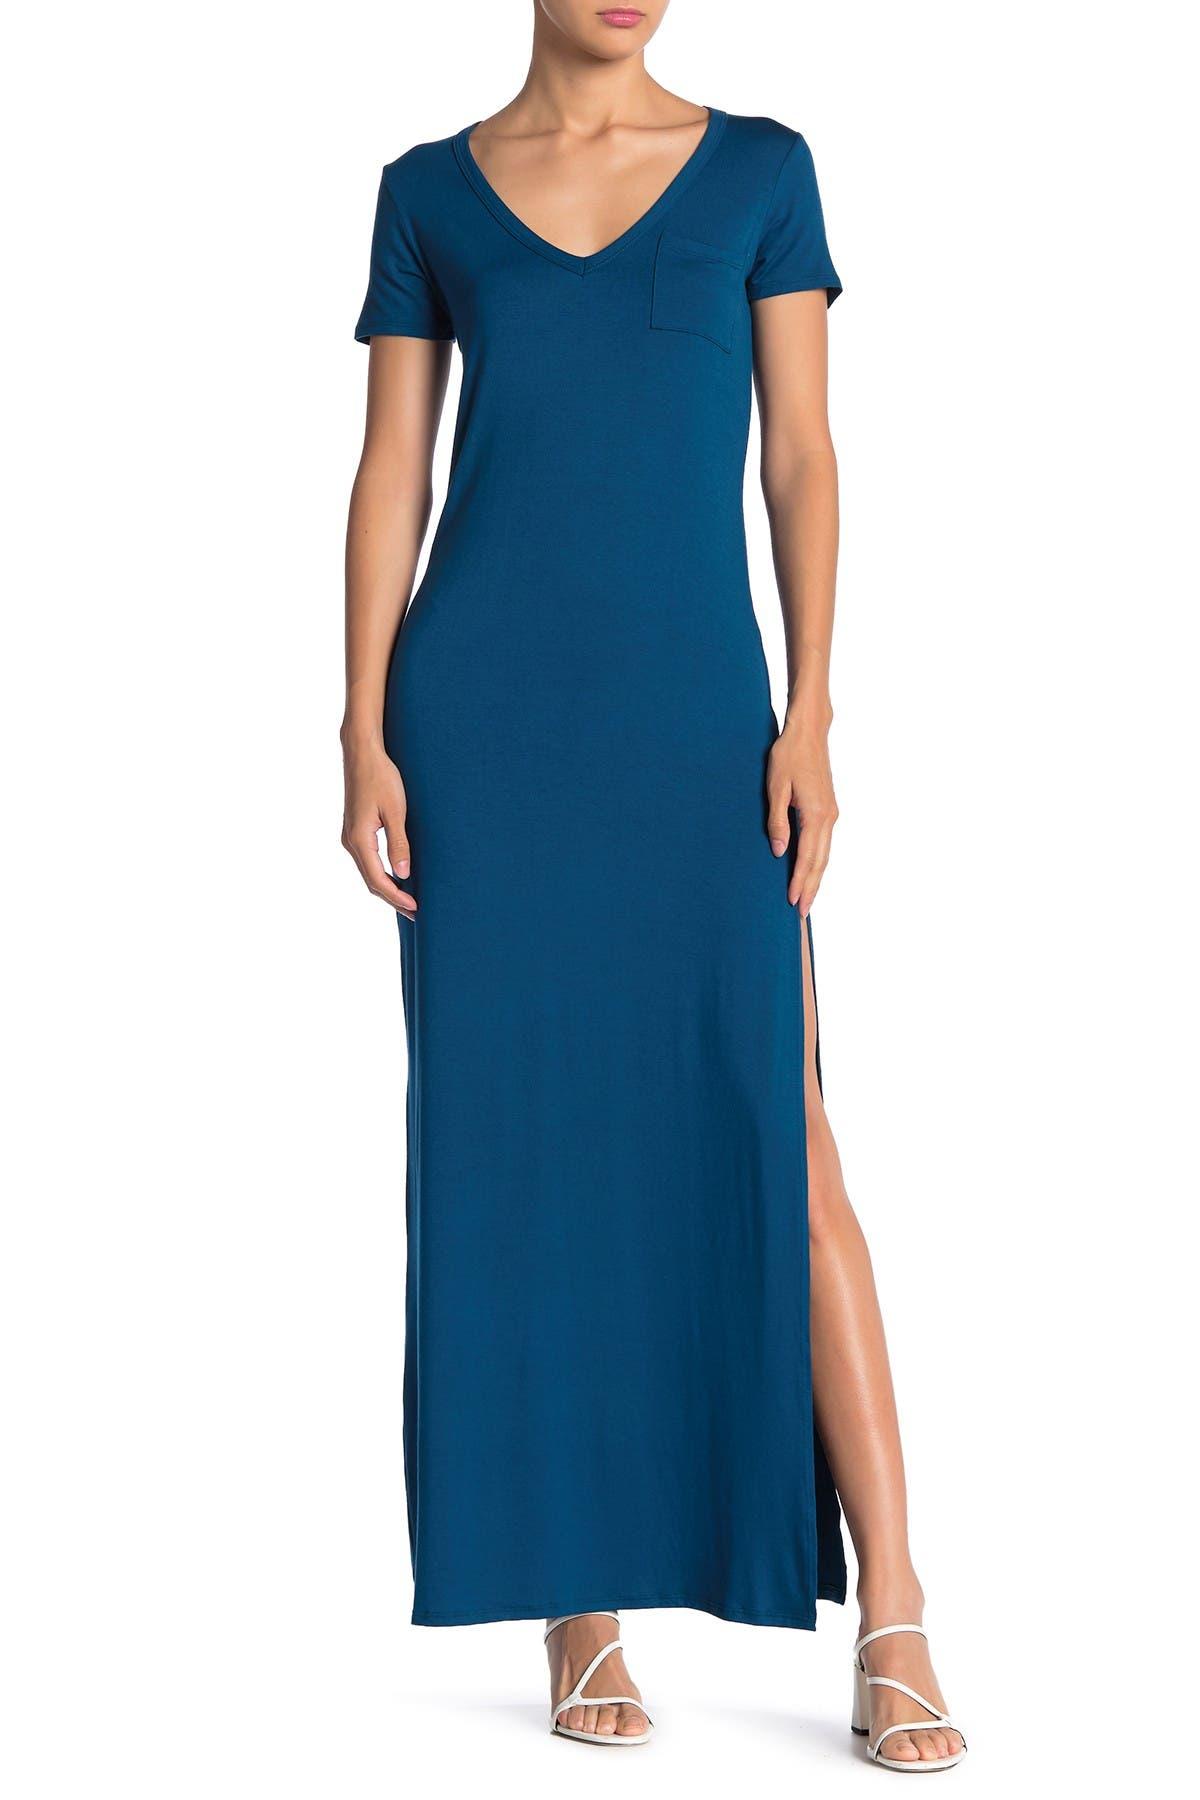 Image of Velvet Torch Side Slit Knit Maxi Dress